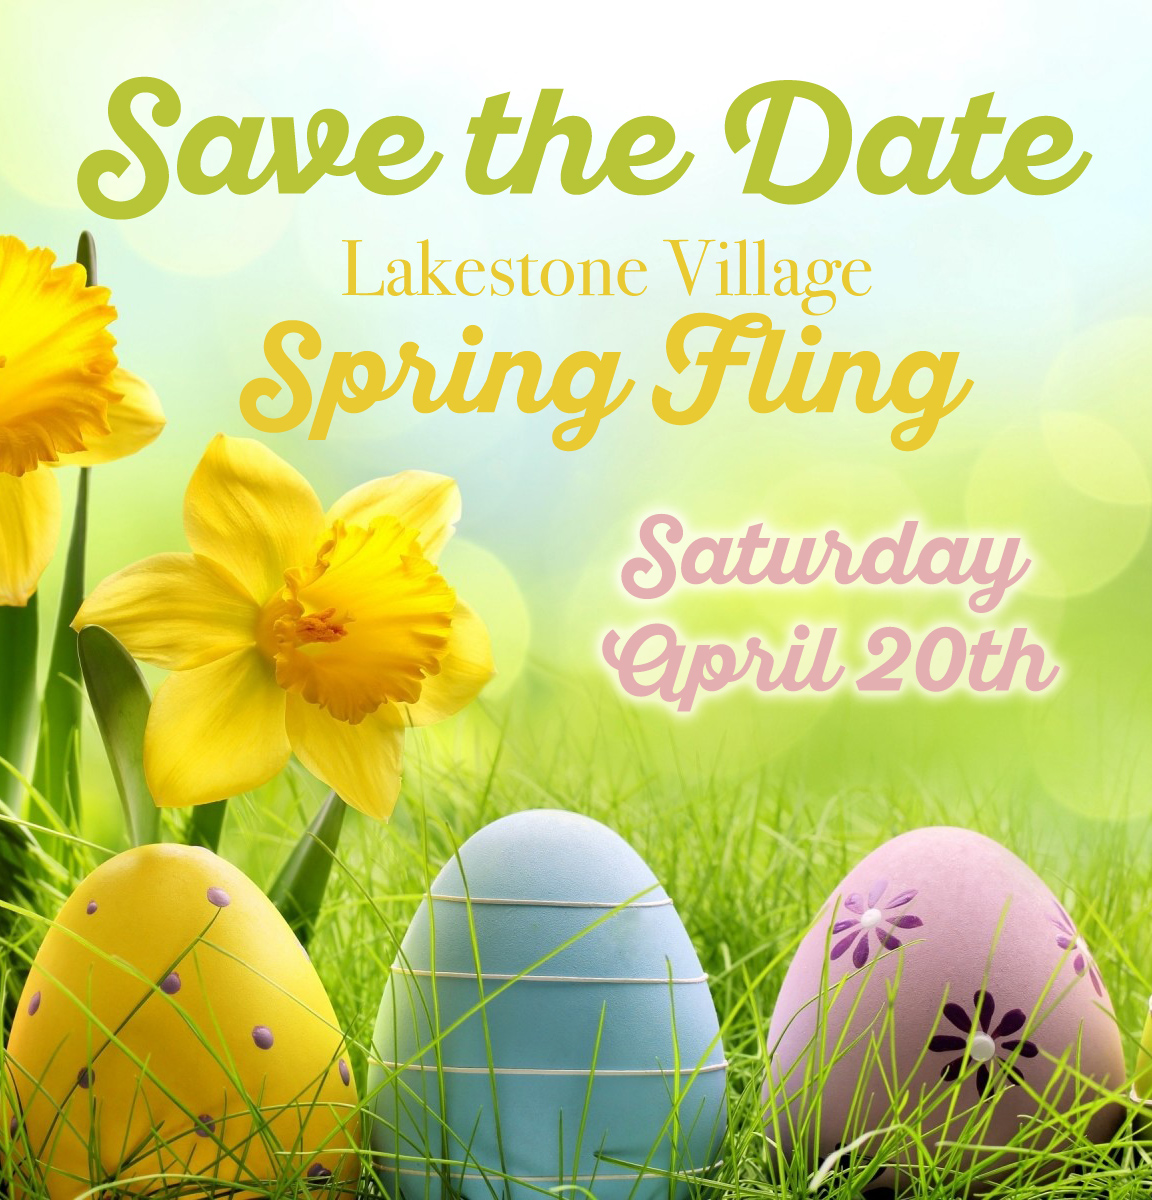 Spring Fling Save the Date.jpg